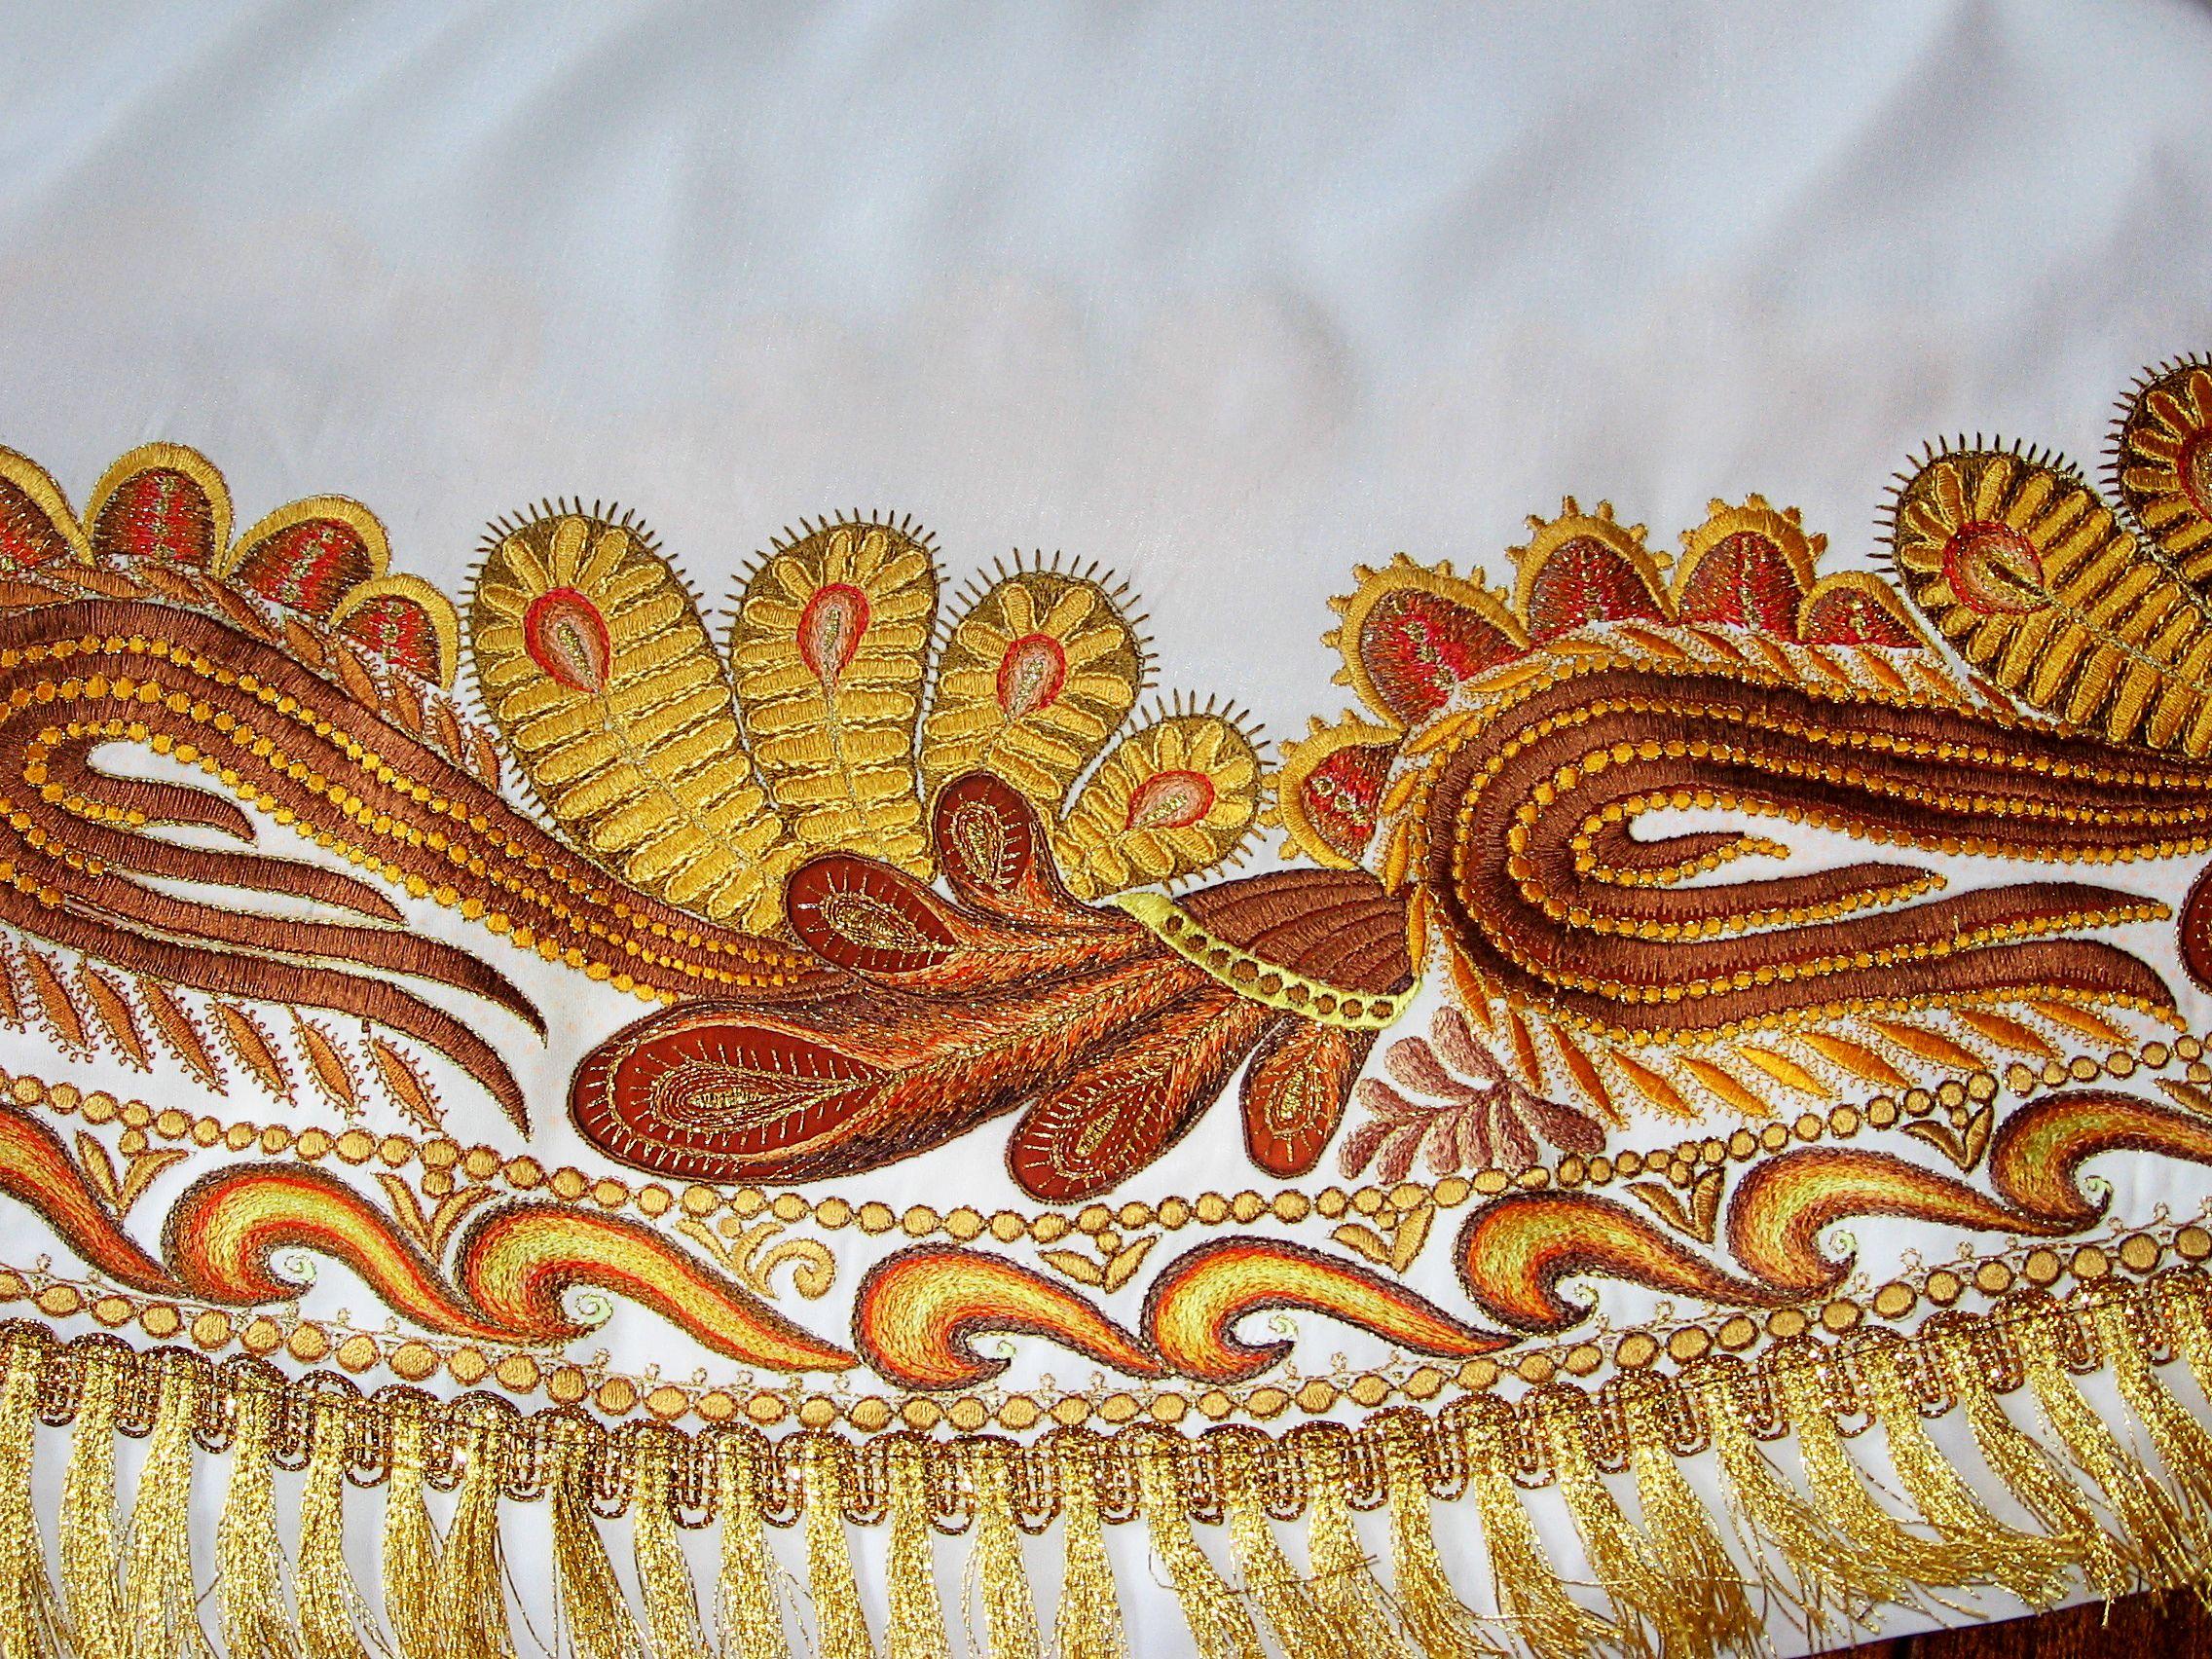 Вышивка в свободно -ходовой технике, new:вышивка на трикотаже, как? Форум 1